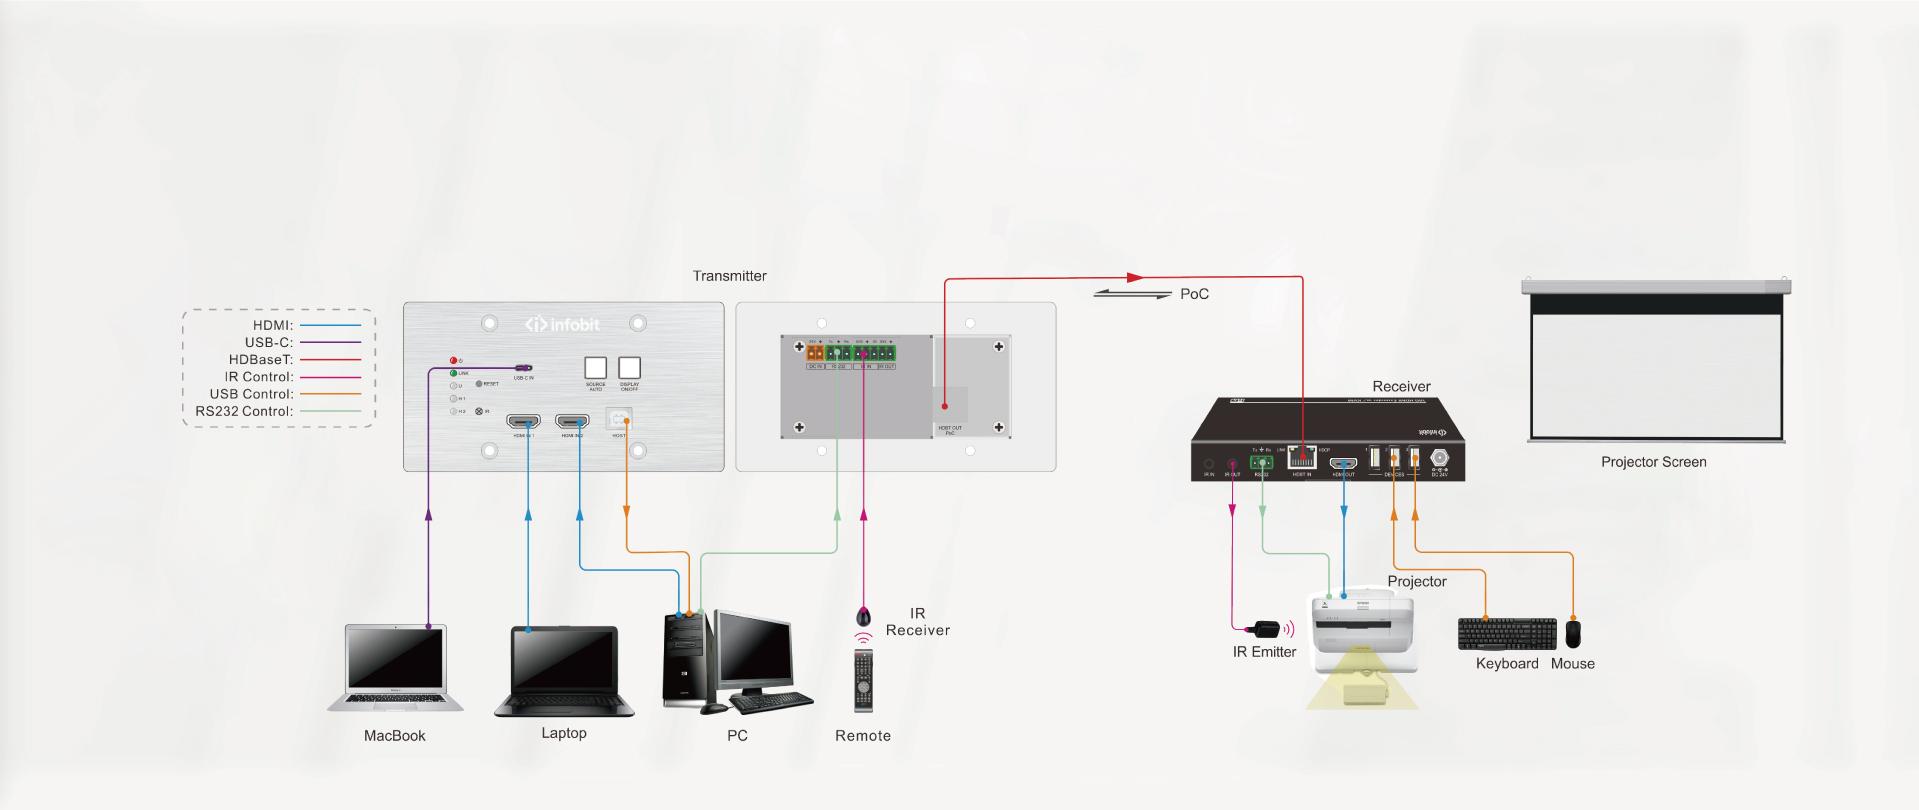 WP301 3x1 wallplate transmitter switcher kit